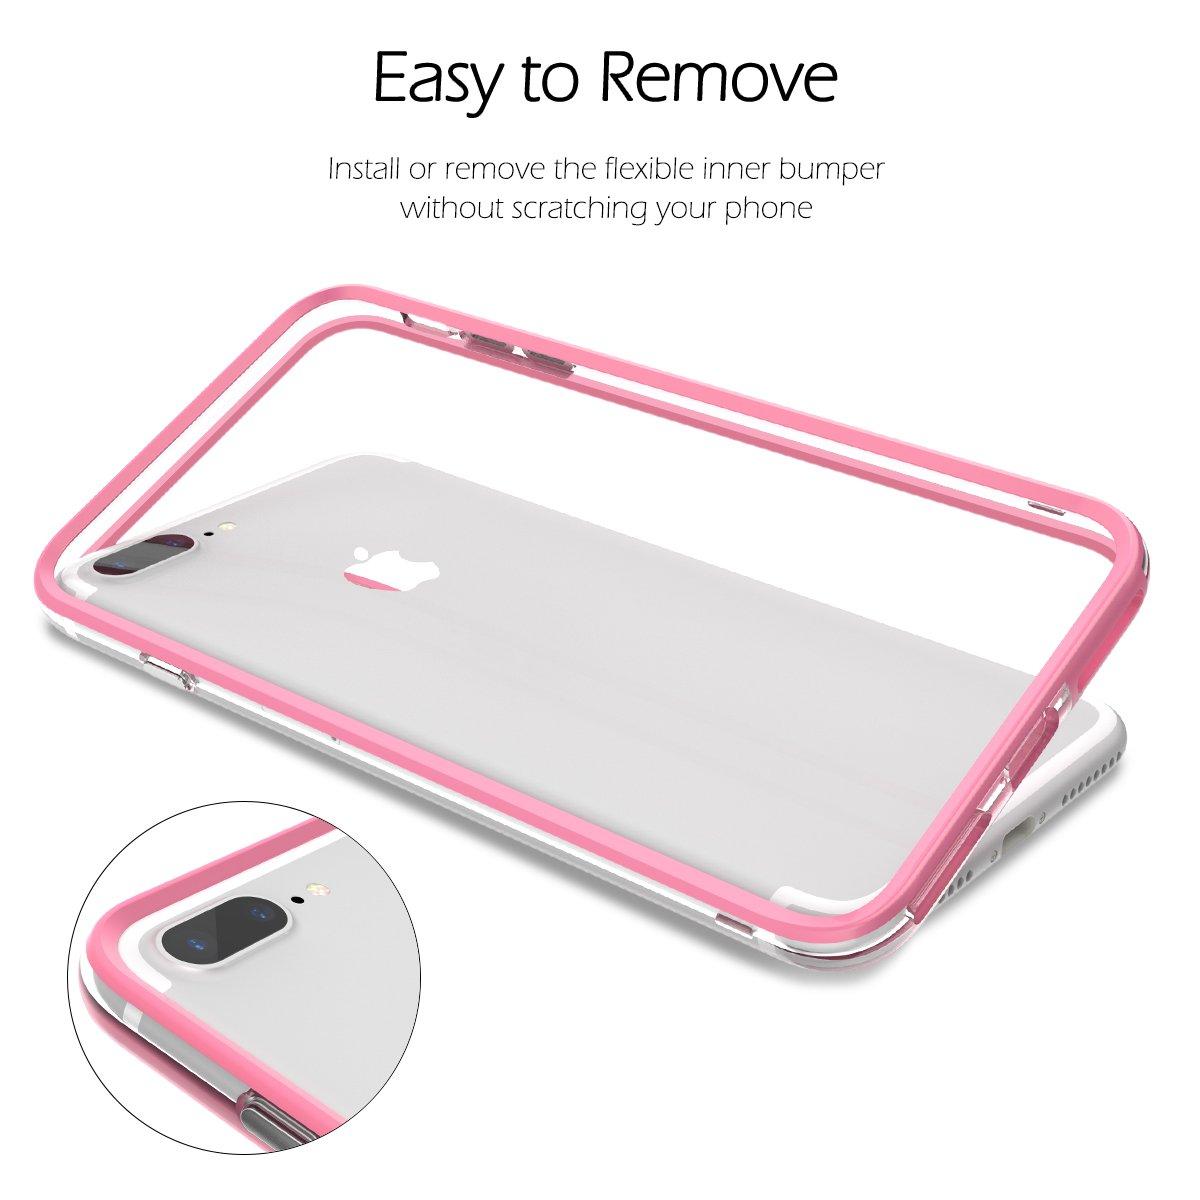 Gr/ün CE-Link iPhone 7 Plus H/ülle iPhone 8 Plus H/ülle Hard Handyh/ülle Ultra Slim D/ünn Bumper mit Innerem Silikon Schutz Schutzh/ülle Protective Sto/ßfest Hart PC Cover